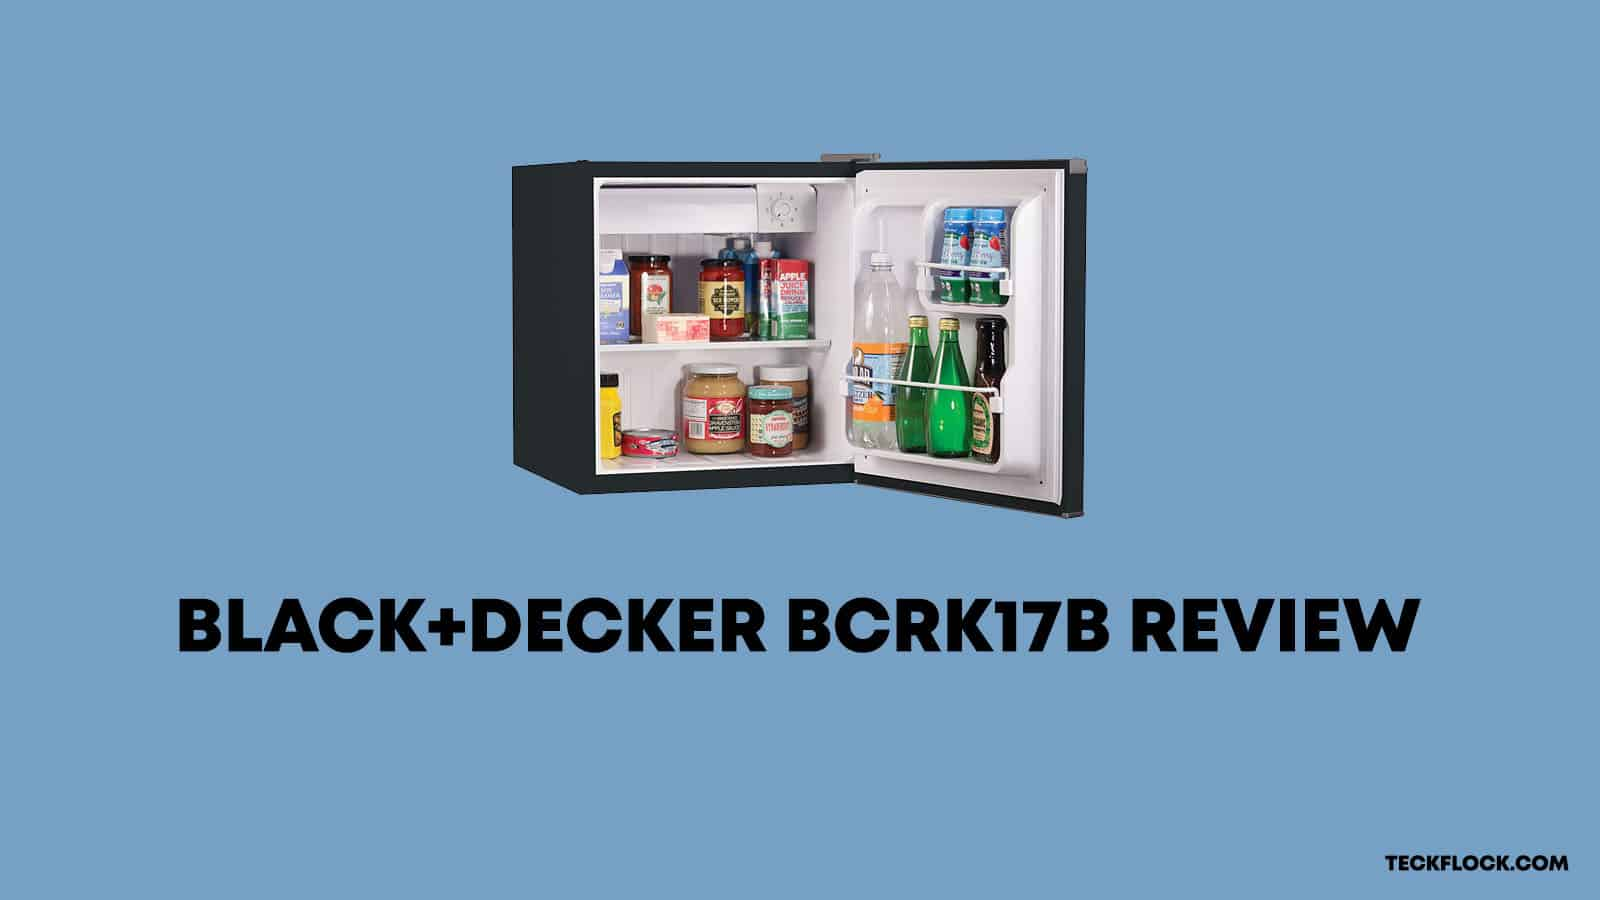 Black+Decker BCRK17 Review